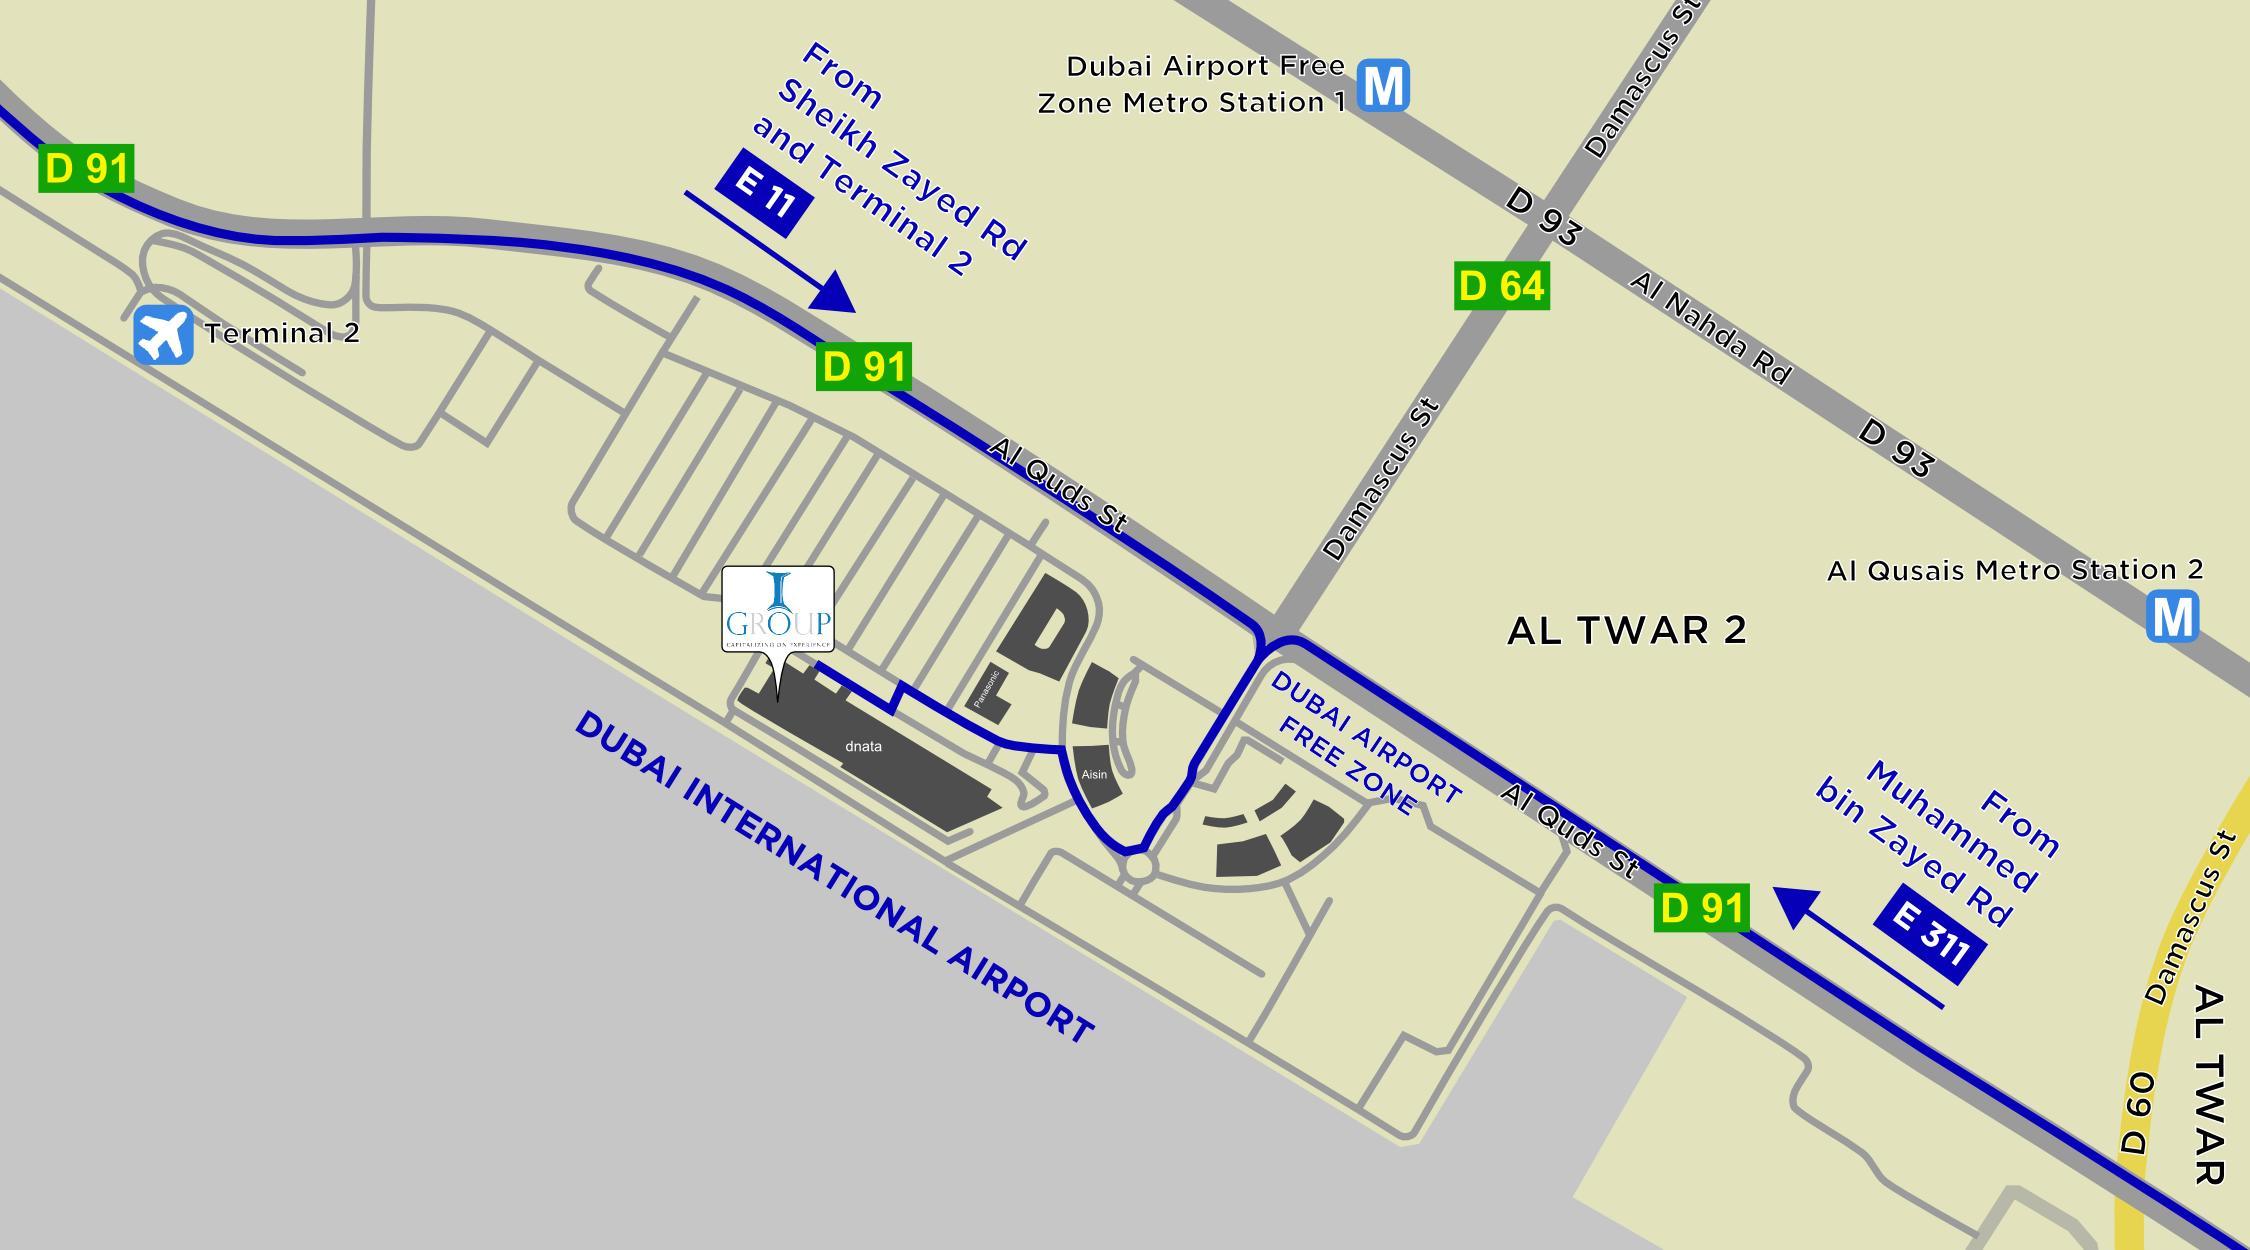 Dubai Airport Map on